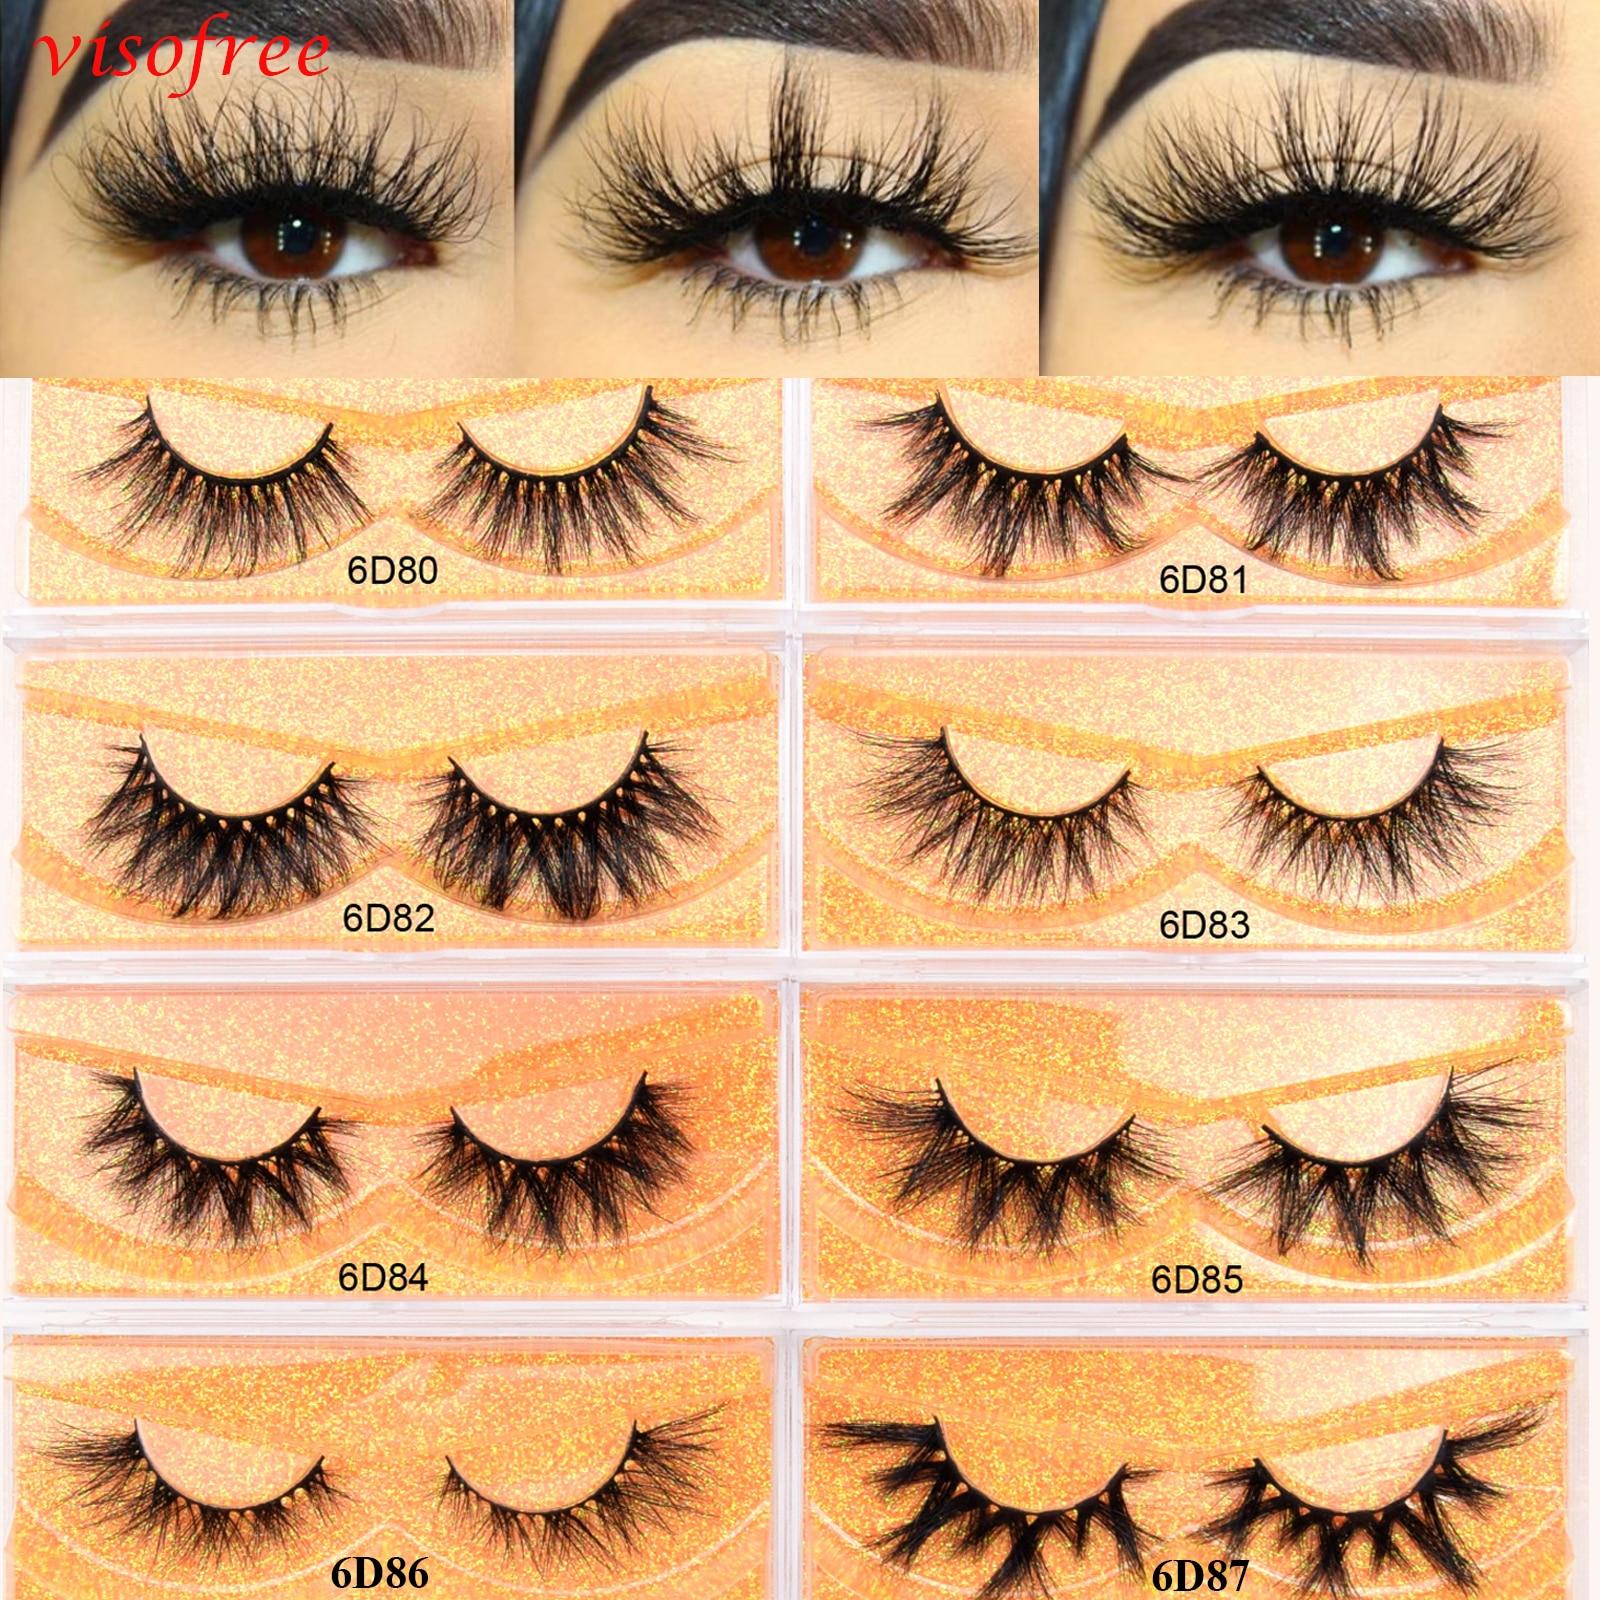 Visofree 5D Mink Eyelashes Cruelty Free Natural False Eyelashes Lashes Fluffy Soft Fake Eyelashes Extension Makeup Eyelashes